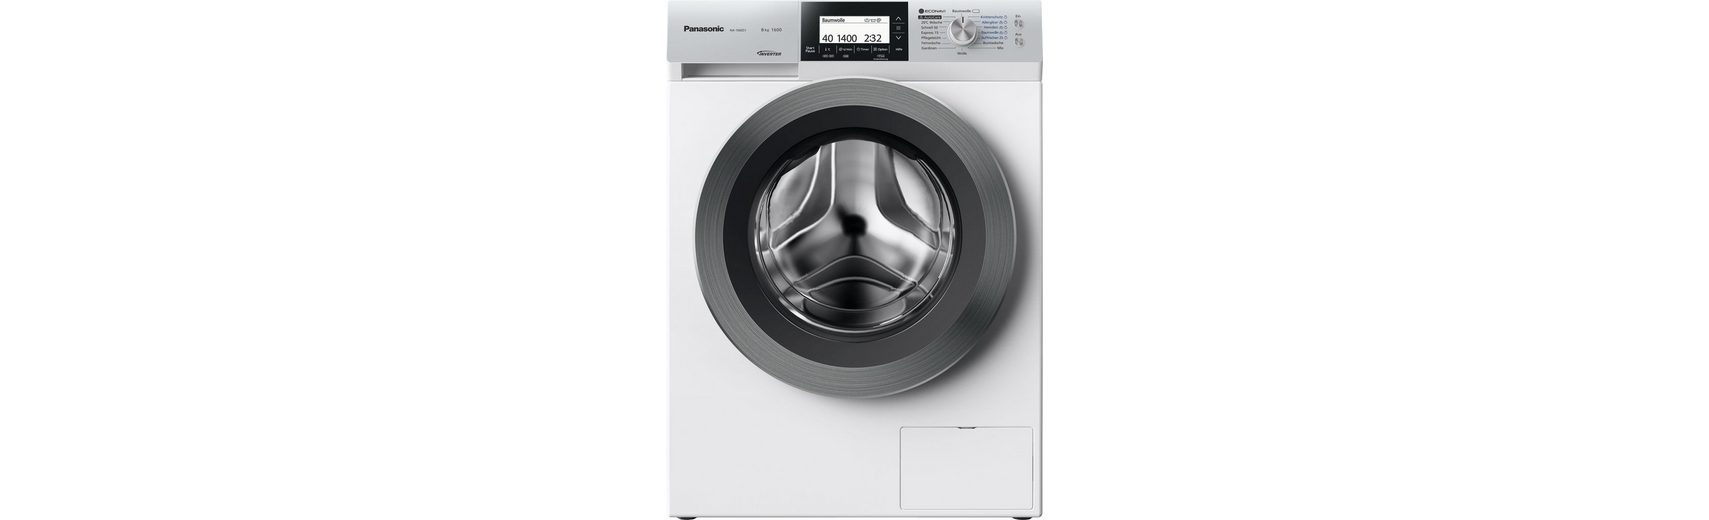 Panasonic Waschmaschine NA-168ZS1WDE, A+++, 8 kg, 1600 U/Min